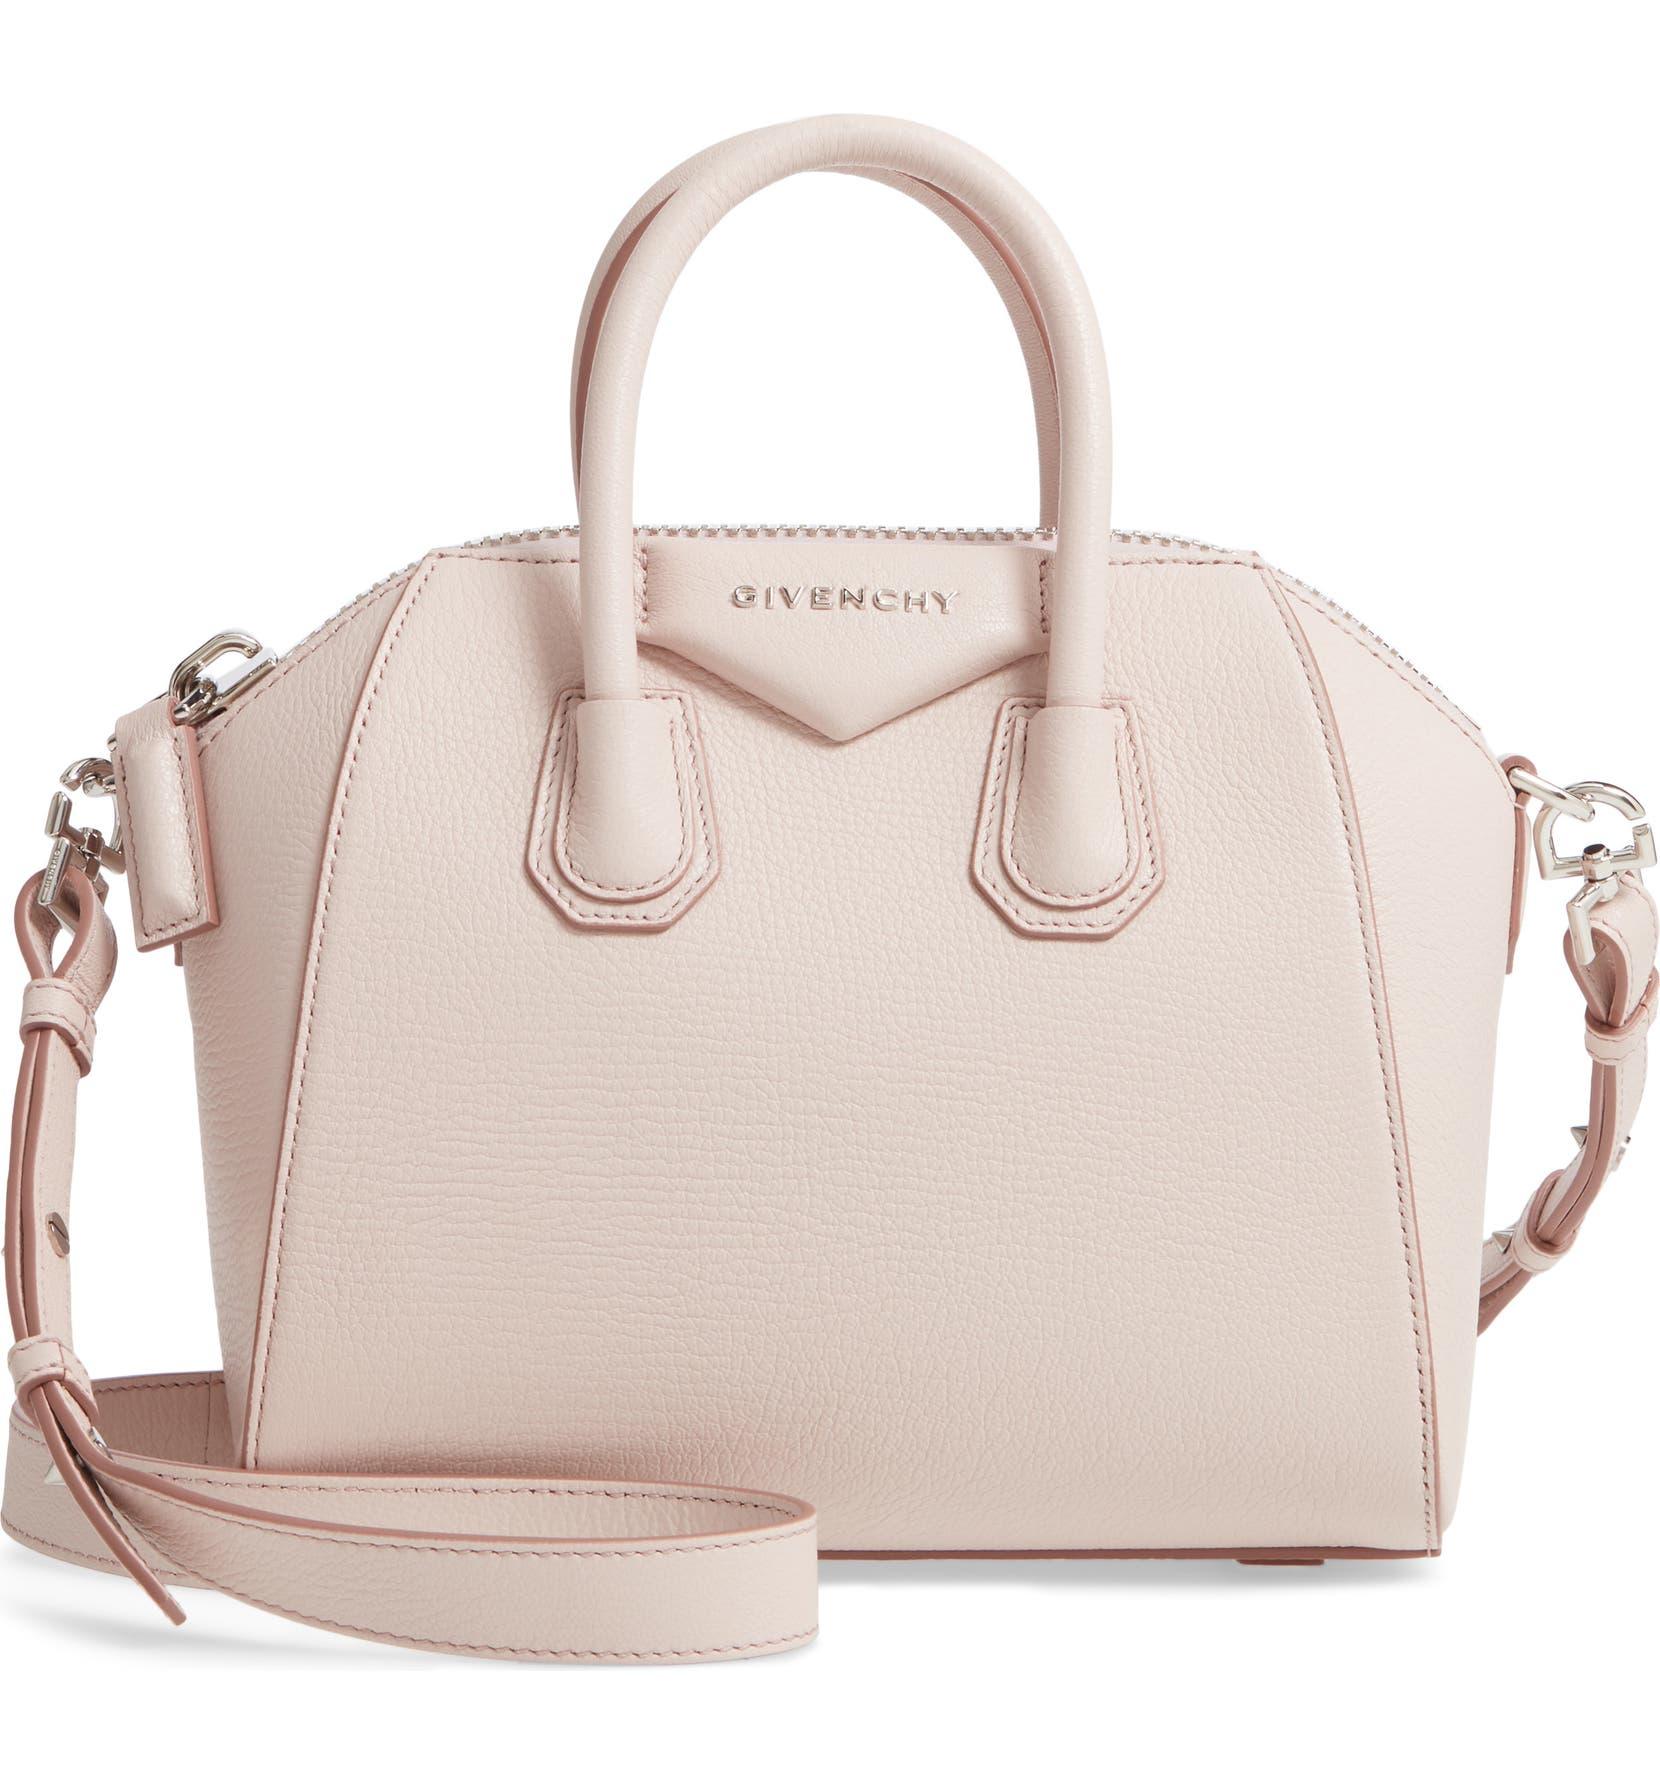 3baa058cad3 Givenchy 'Mini Antigona' Sugar Leather Satchel | Nordstrom